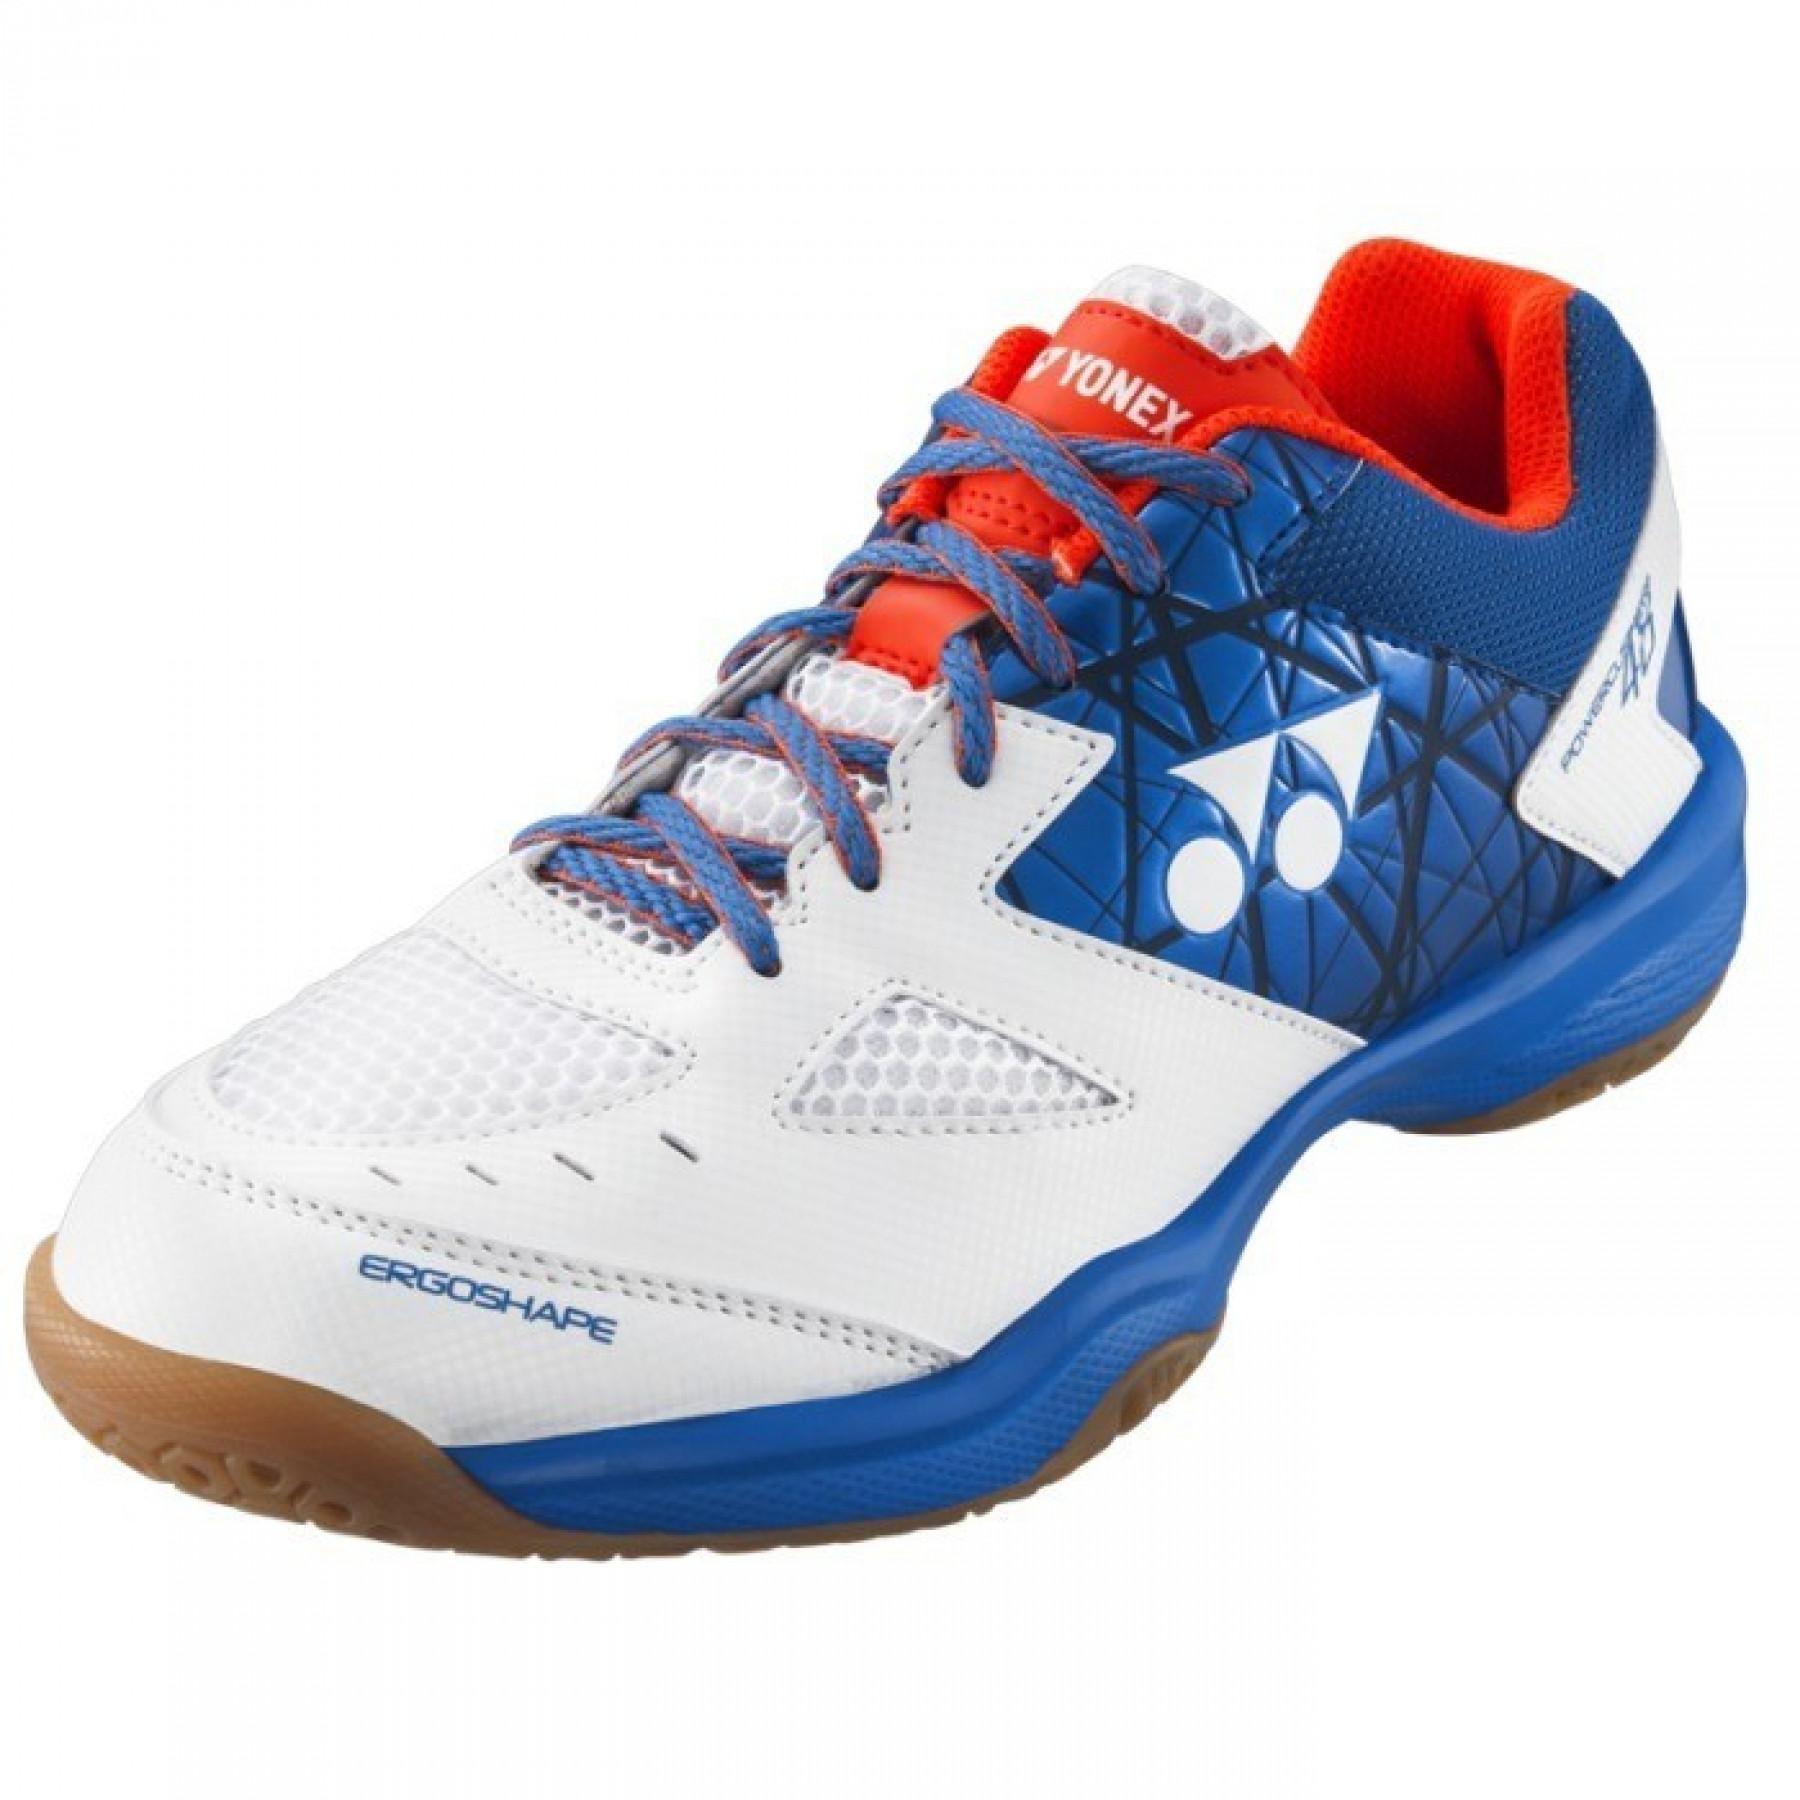 Yonex power cushion 48 shoes